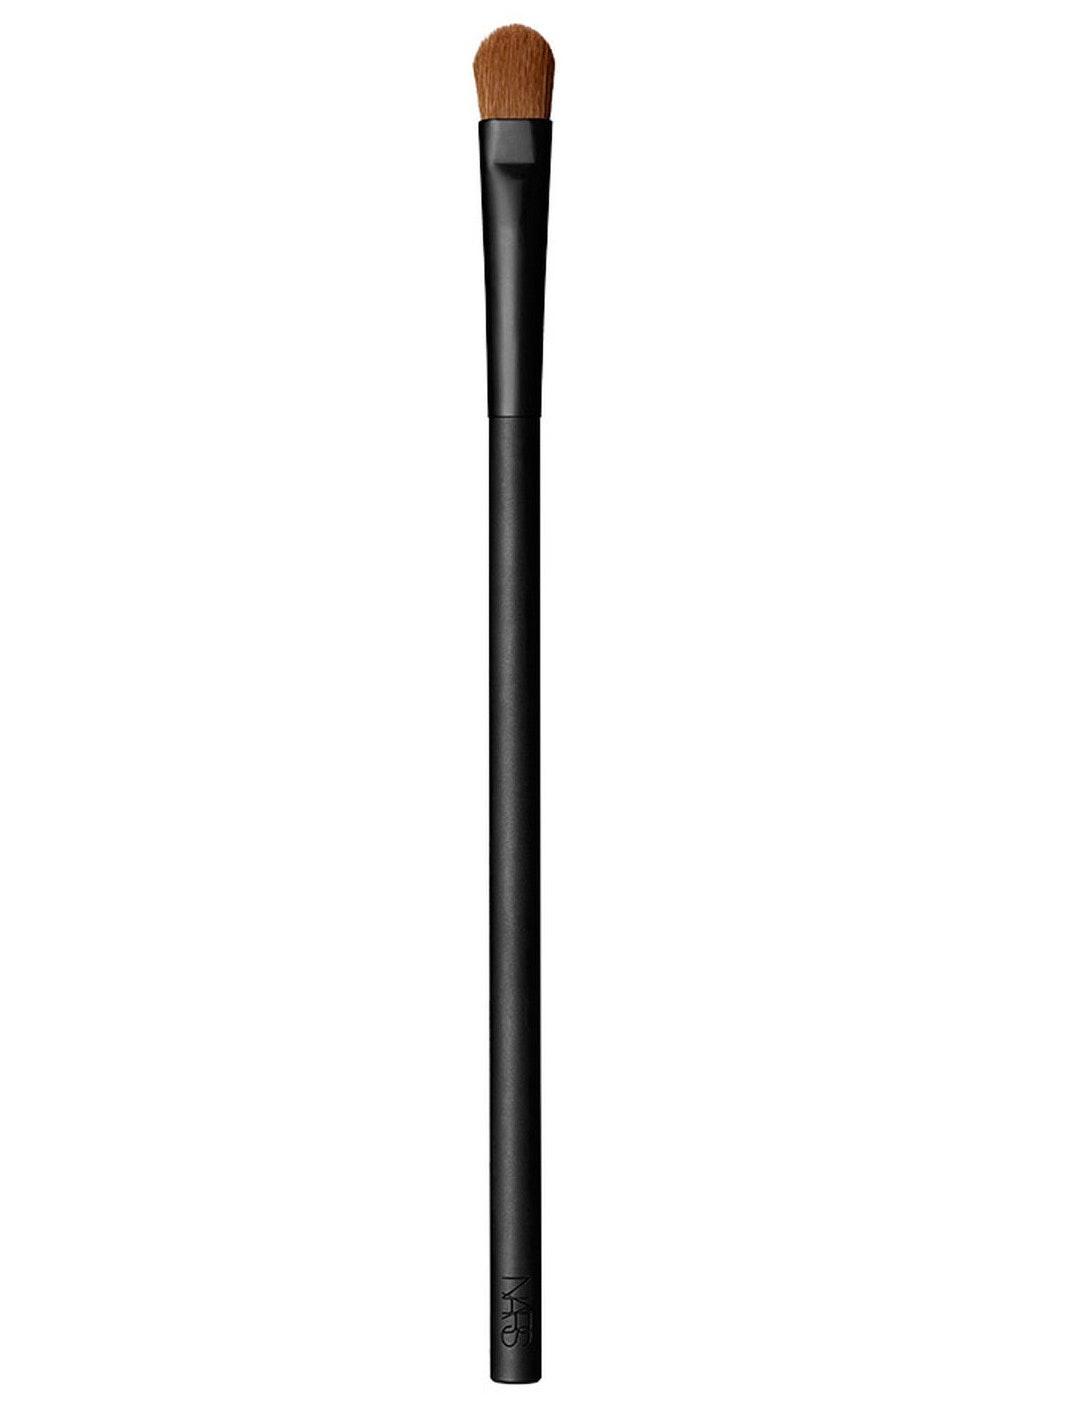 NARS® #49 Wet/Dry Eyeshadow Brush